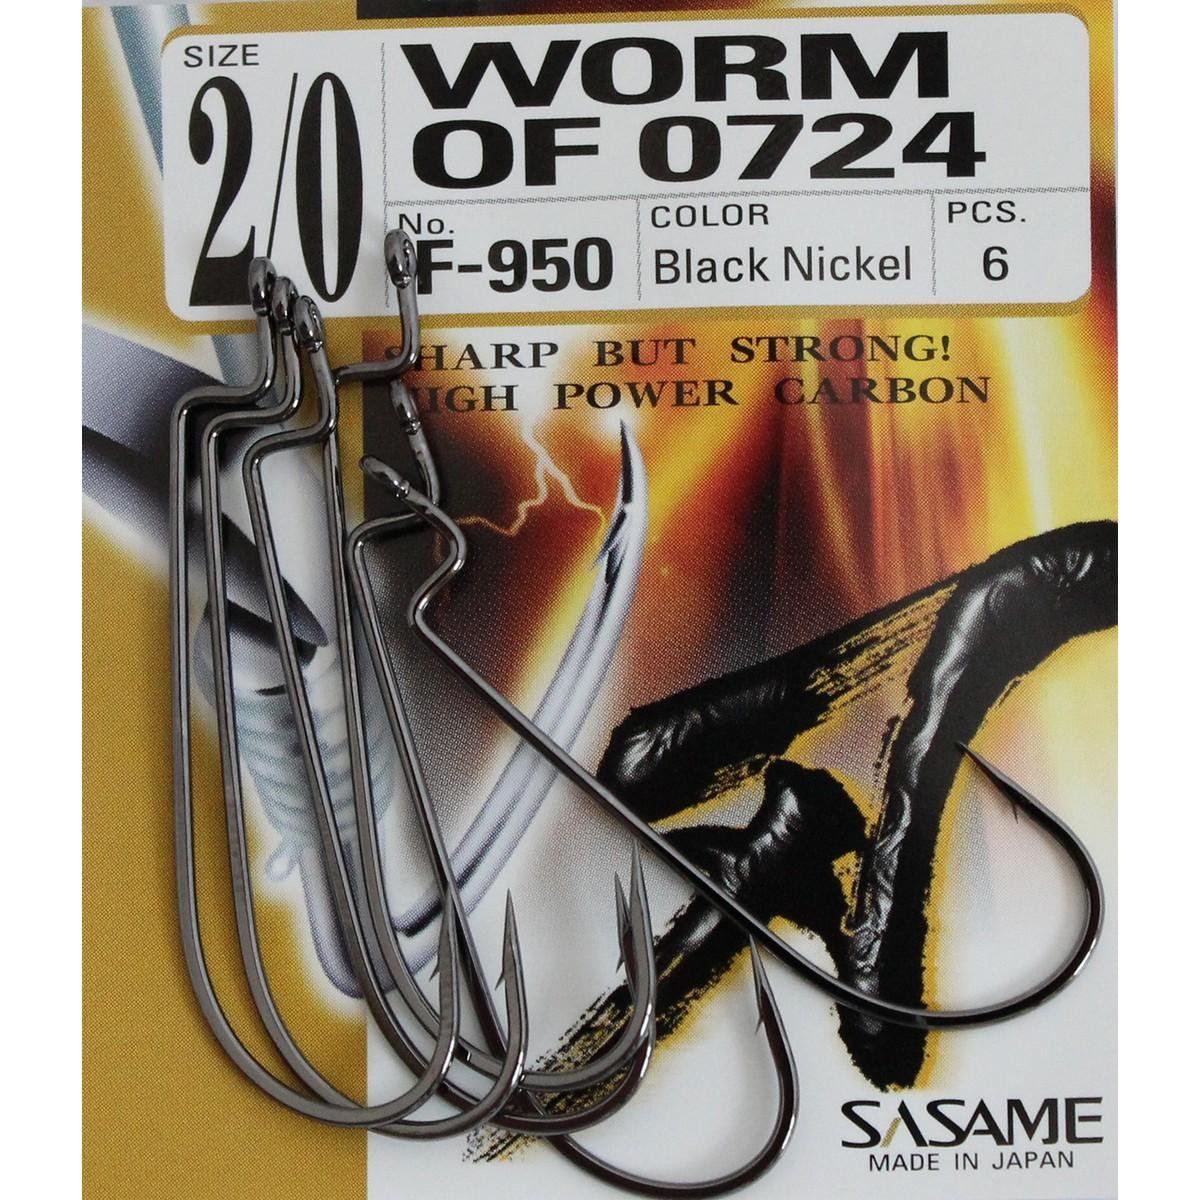 Sasame Worm F-950